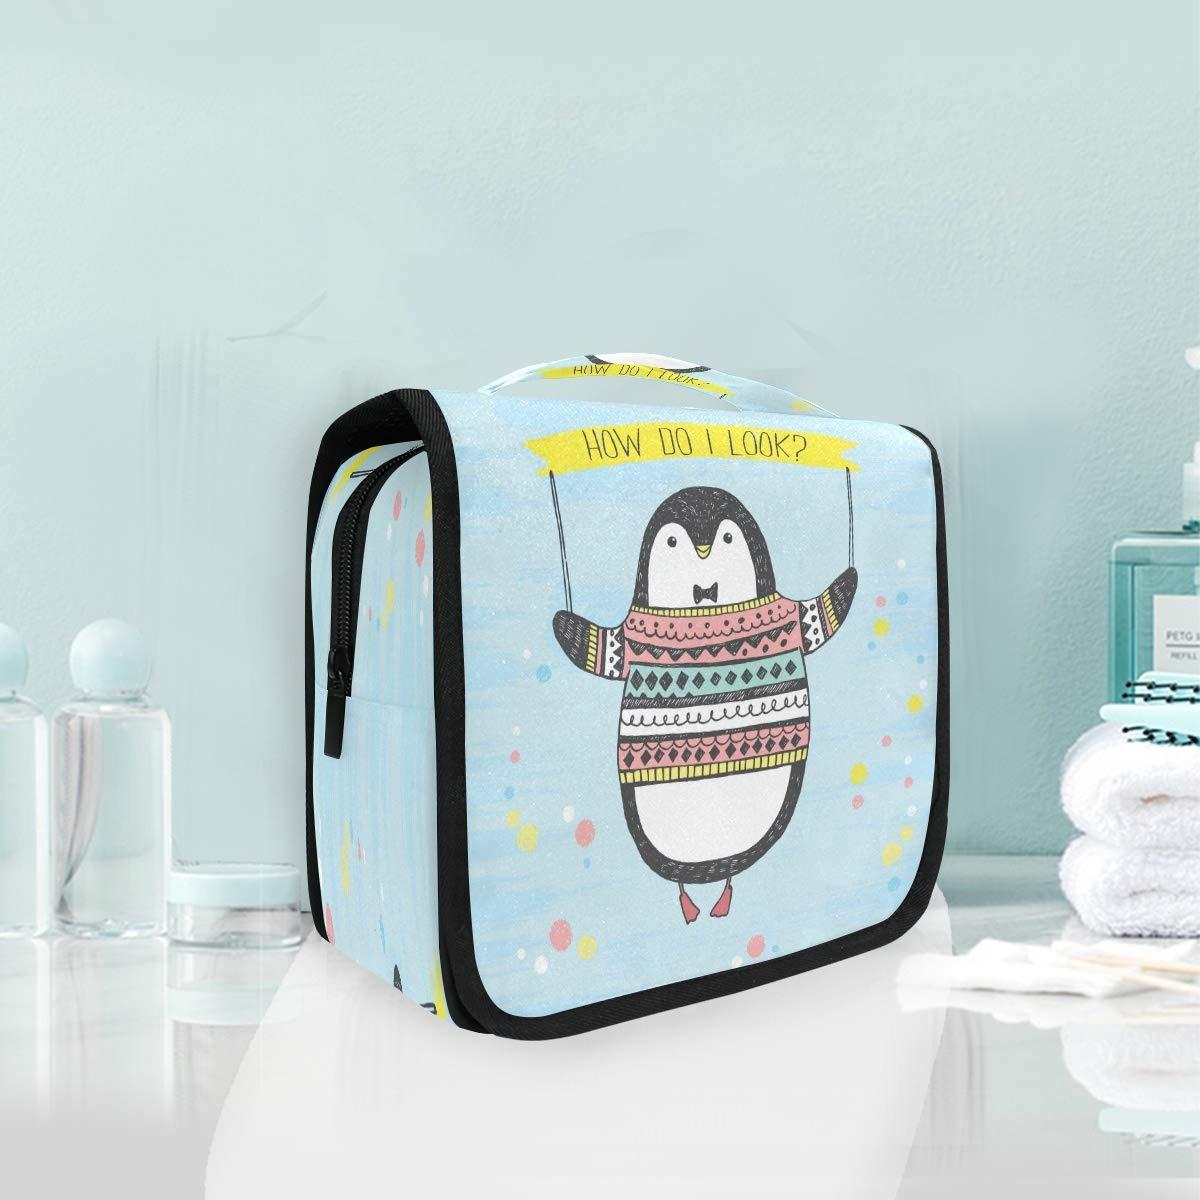 Blue Funny Penguin Hanging Foldable Bag Makeup Arlington Mall Toiletry Washington Mall Cosmetic